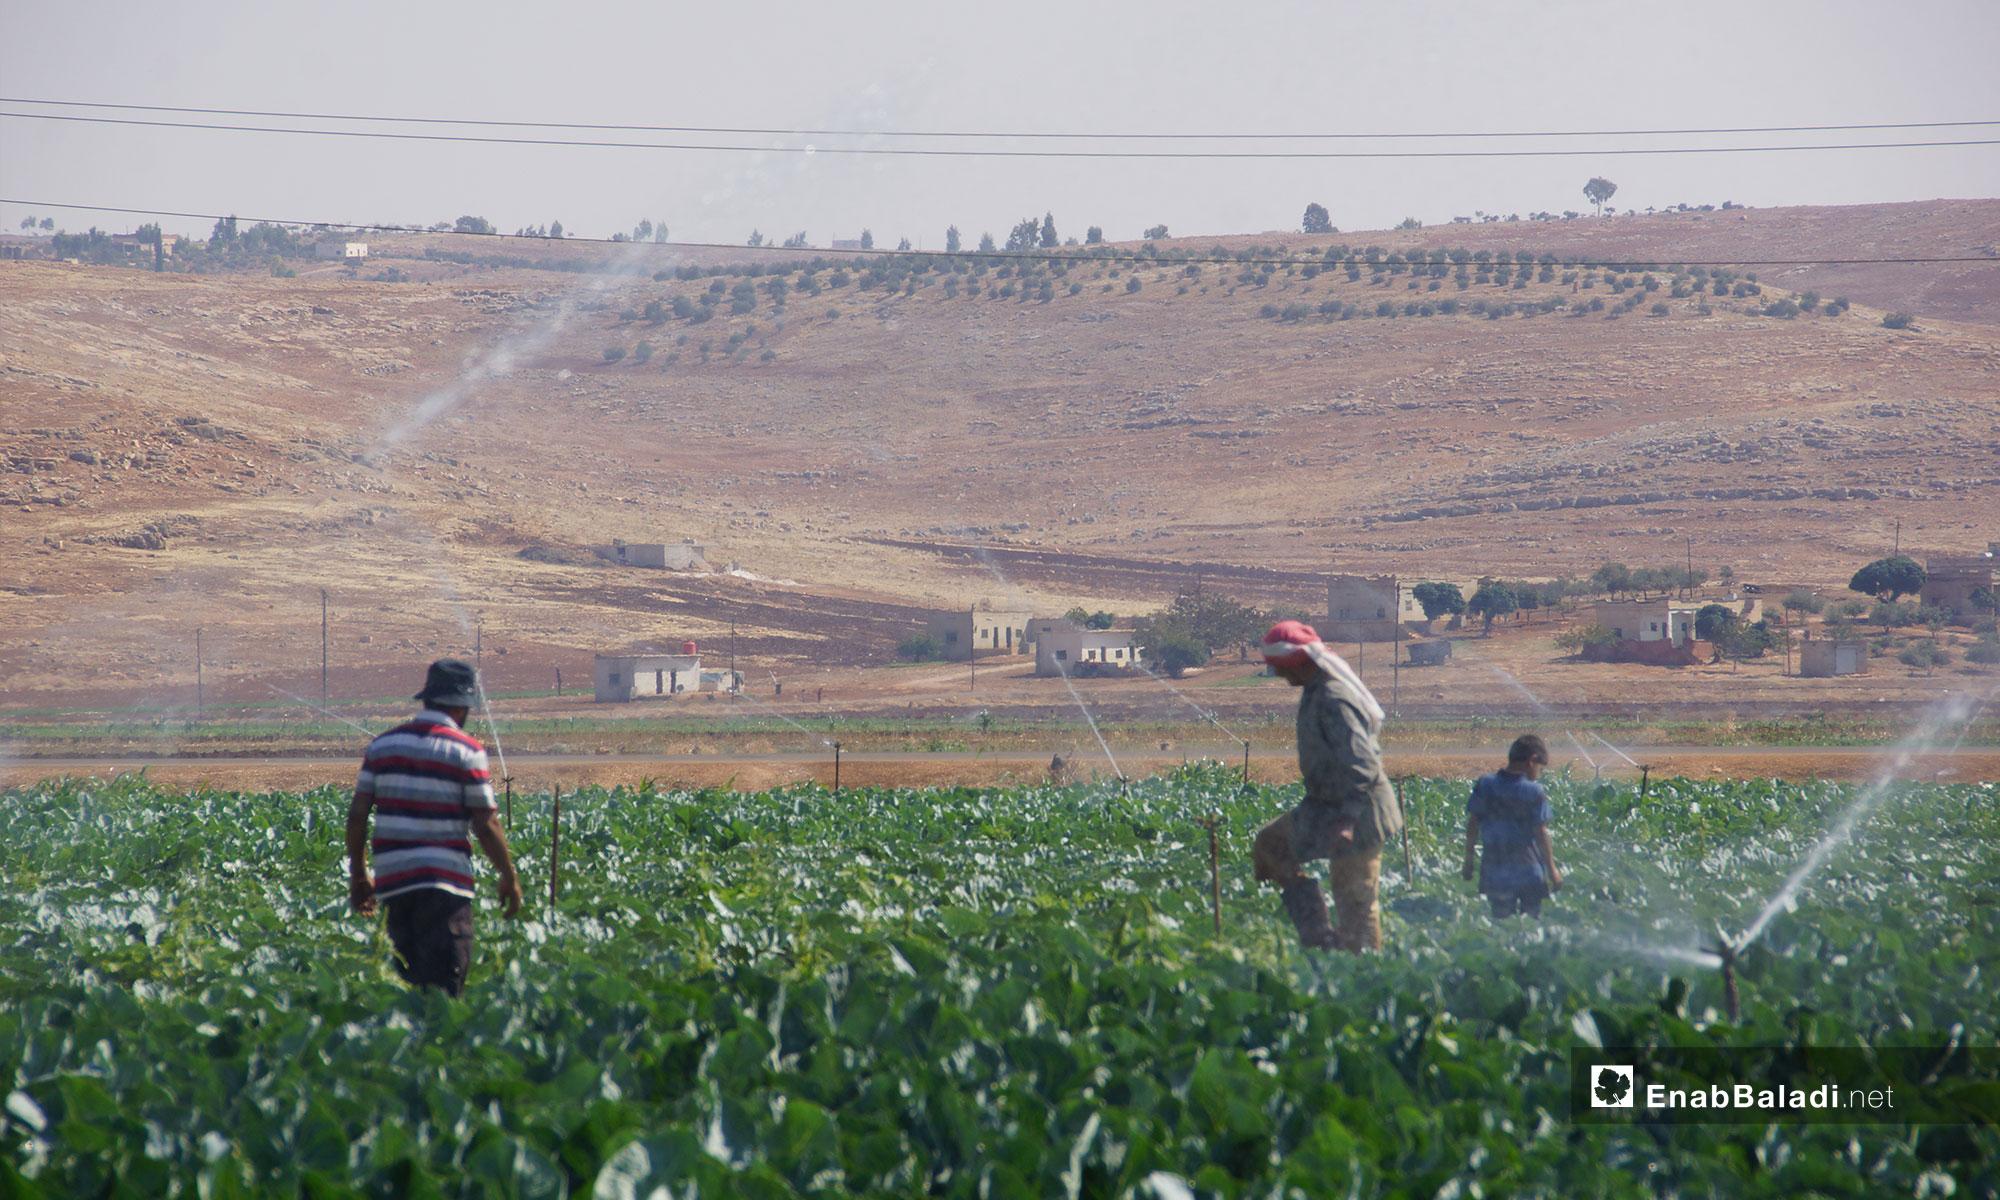 Planting vegetables in Hama countryside - 29 August 2018 (Enab Baladi)